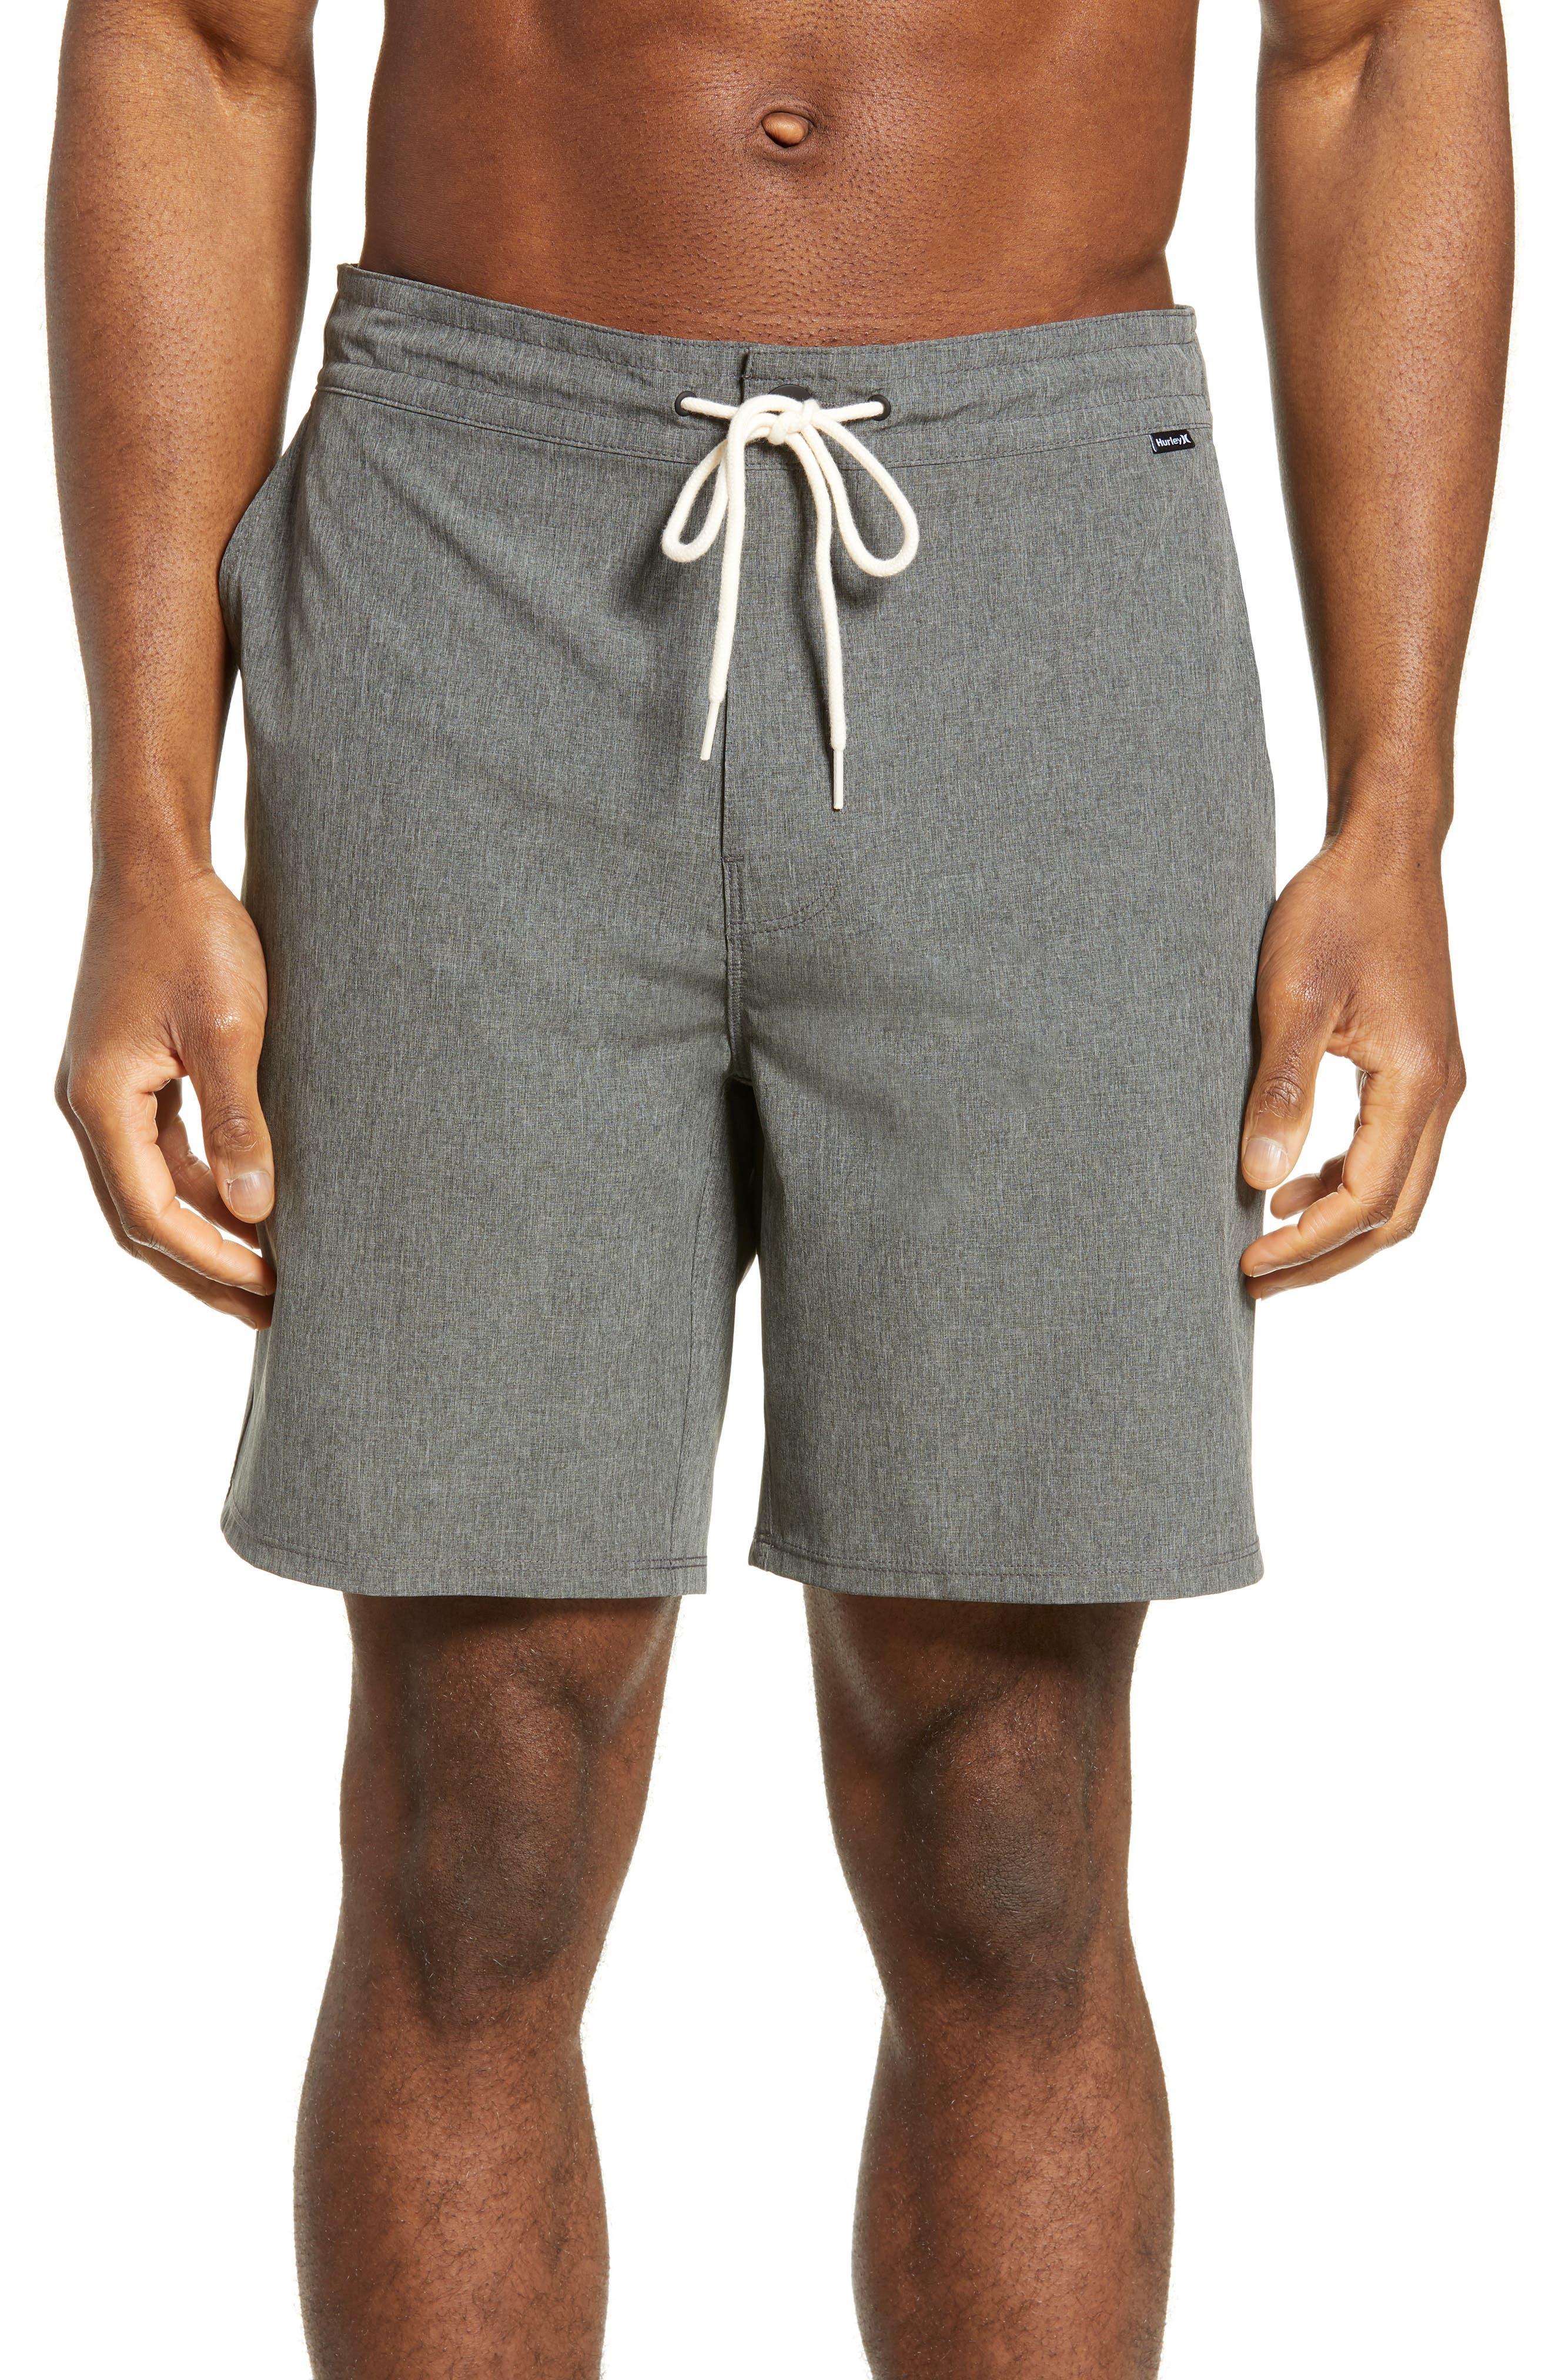 Hurley Phantom Wasteland Recycled Board Shorts, Grey